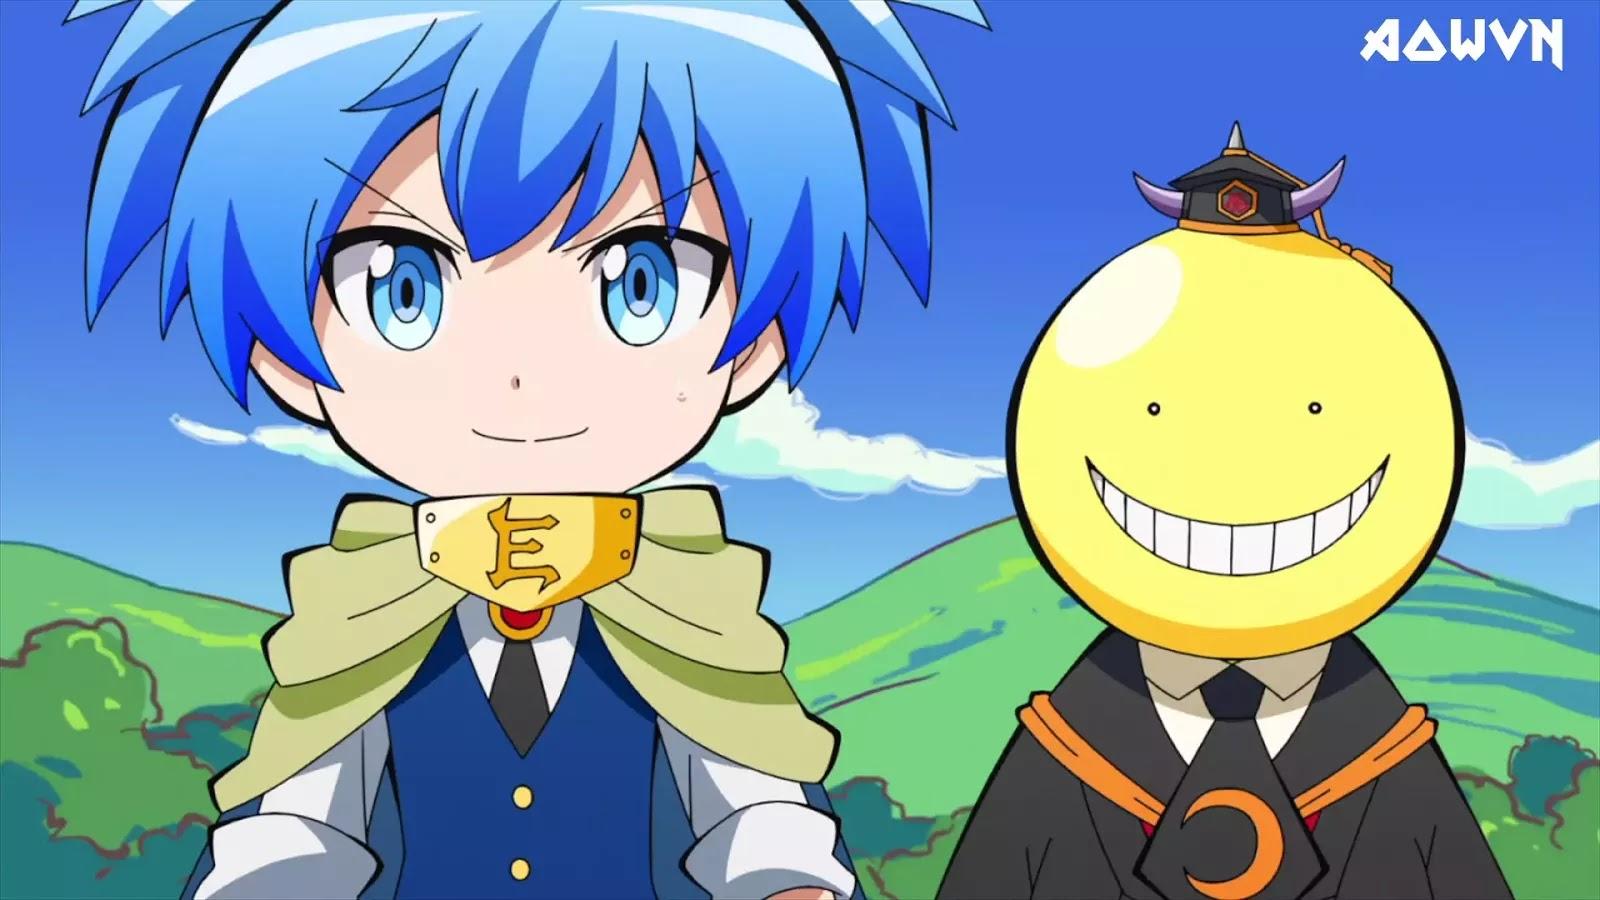 koro aowvn - [ Anime 3gp mp4 ] Koro-sensei Quest! Vietsub – Specials của Anime LHAS